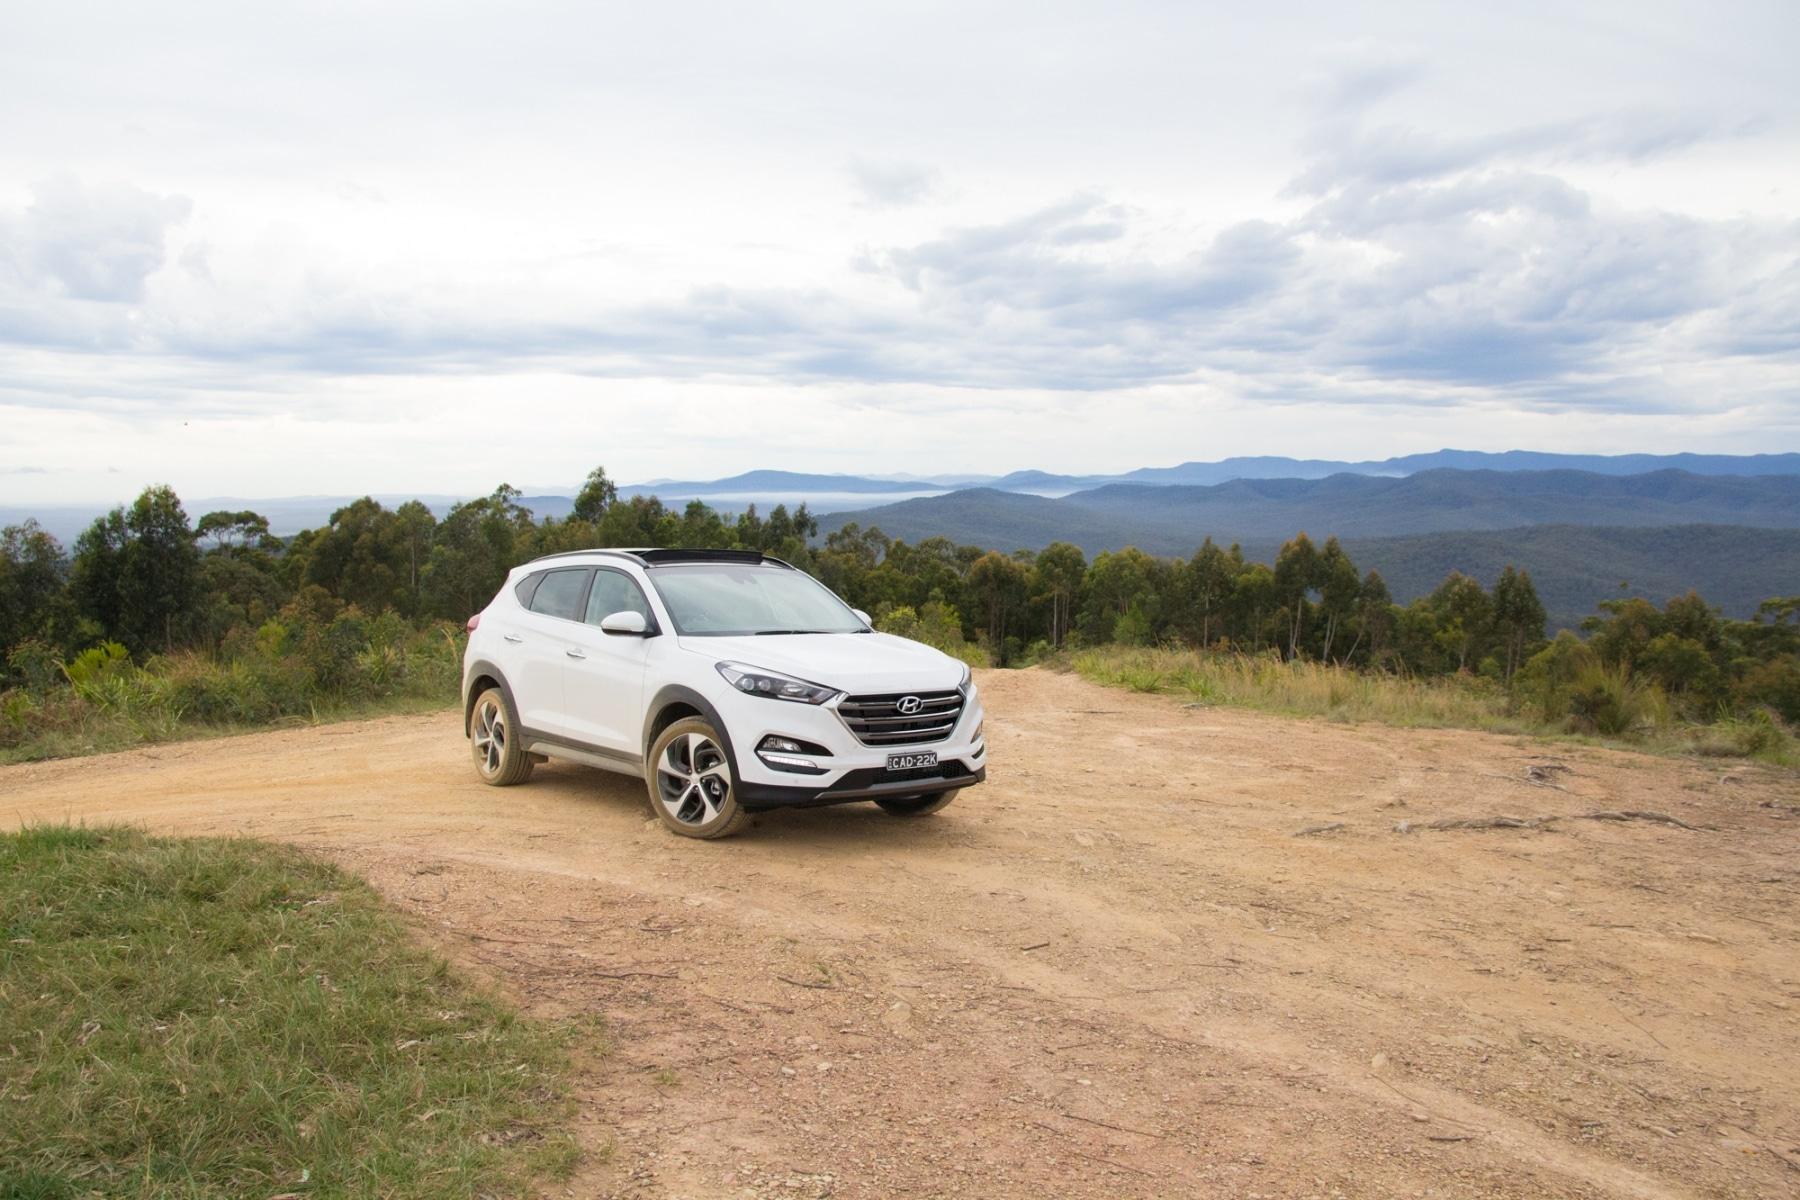 Hyundai Tucson Highlanderon dirt road